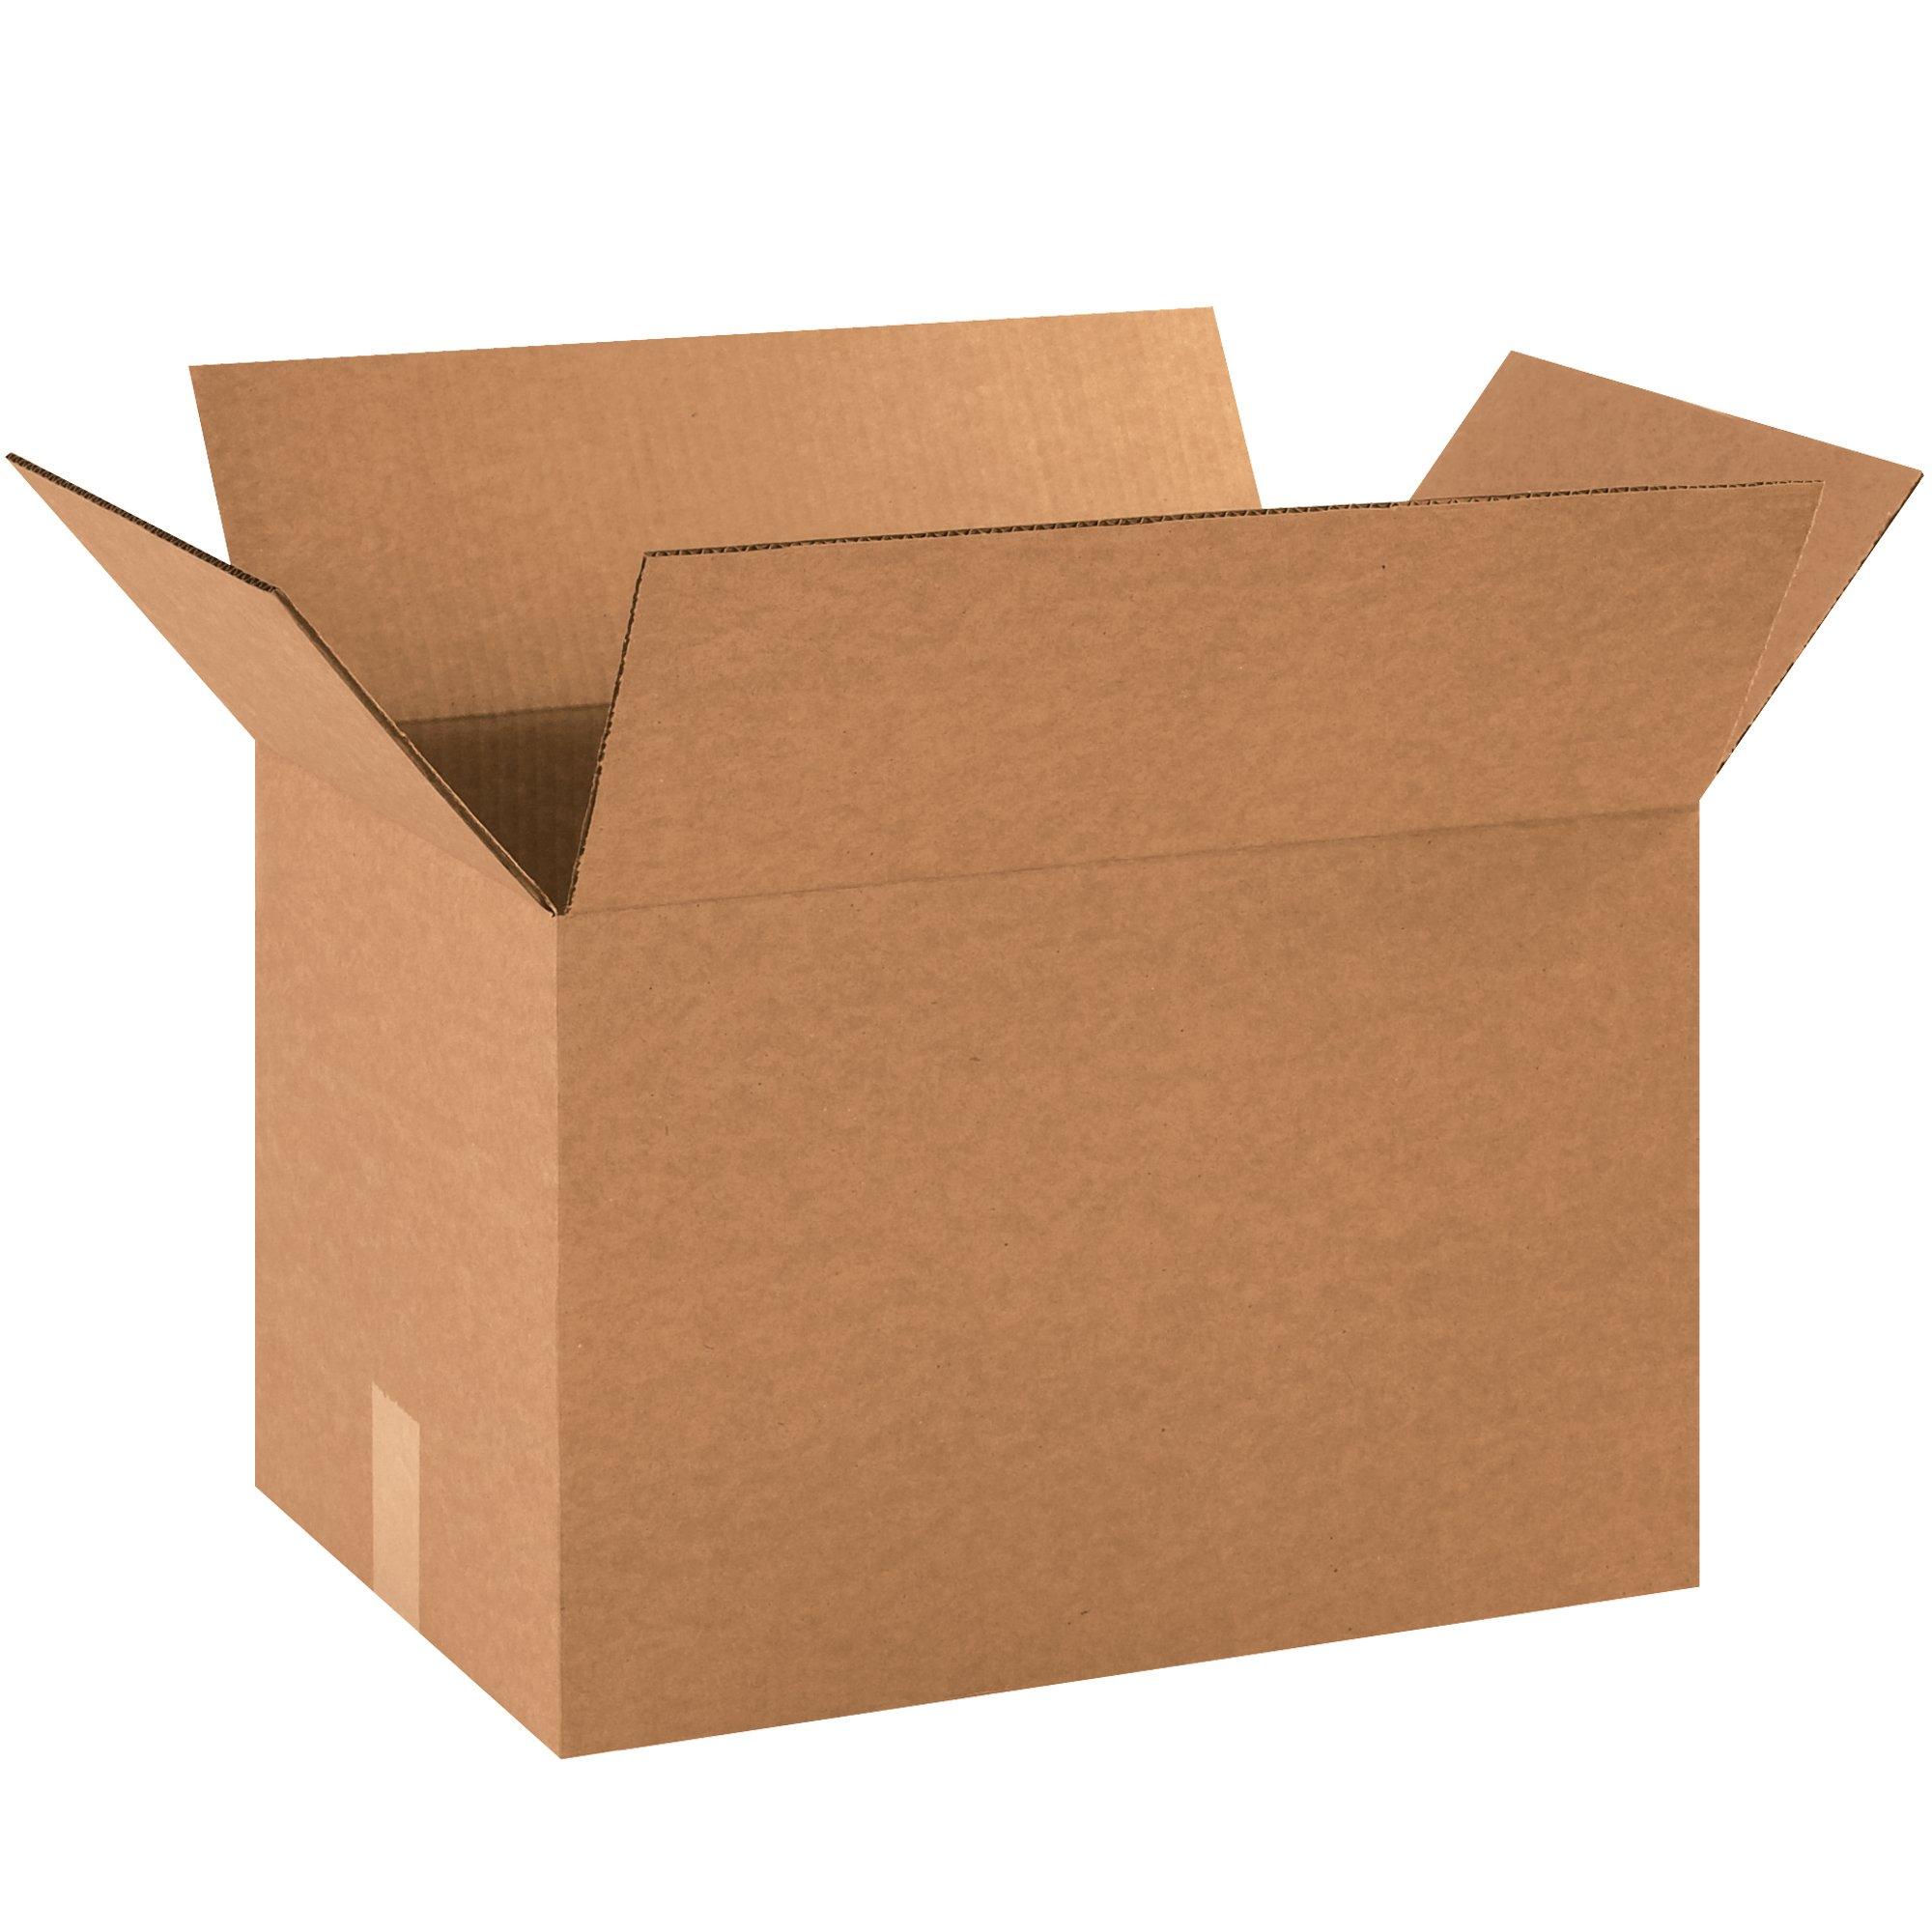 BOX USA B181212500PK Corrugated Boxes, 18''L x 12''W x 12''H, Kraft (Pack of 500)